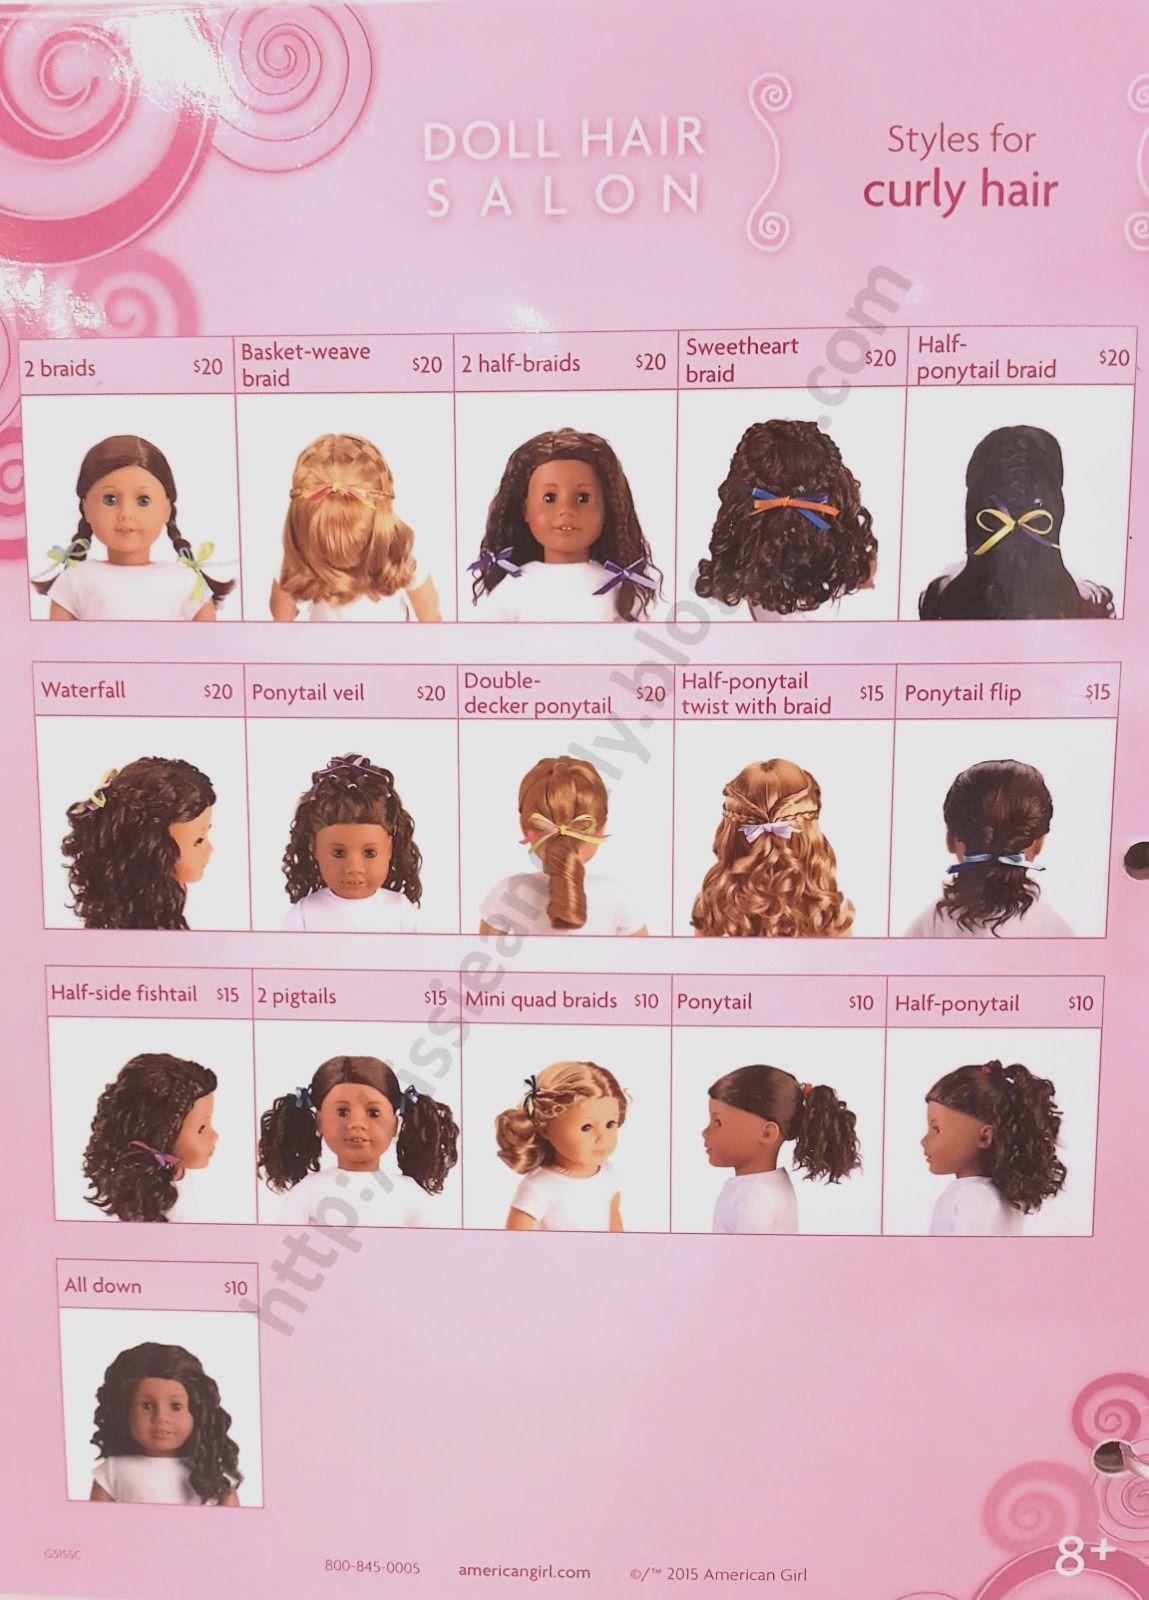 Hairstyles for short hair american girl dolls american girl hair